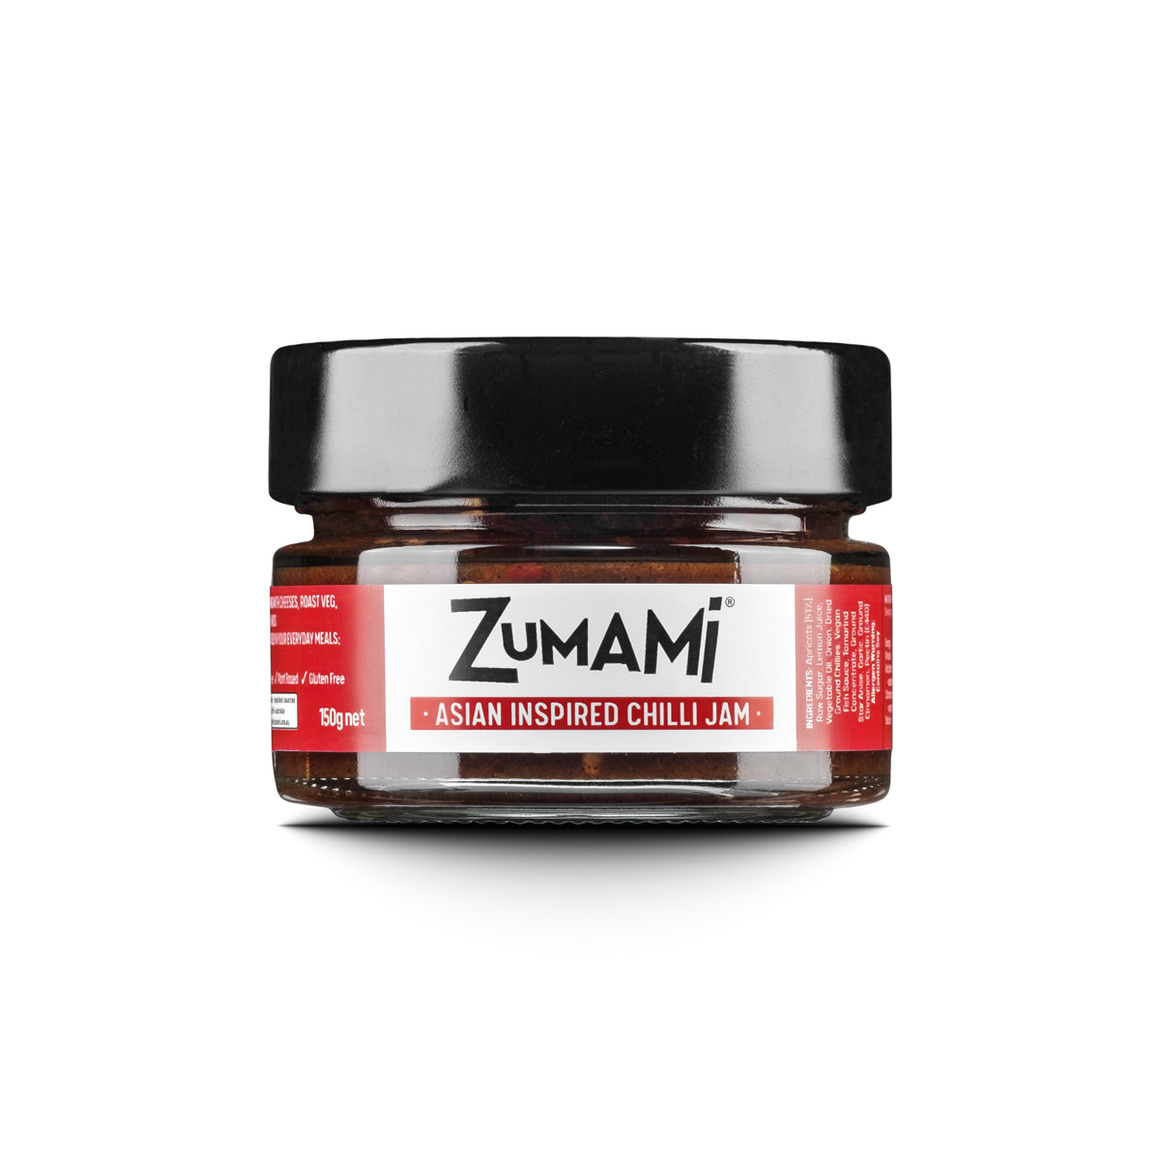 ZUMAMI - Asian Inspired Chilli Jam - Vegan Friendly | Trada Marketplace